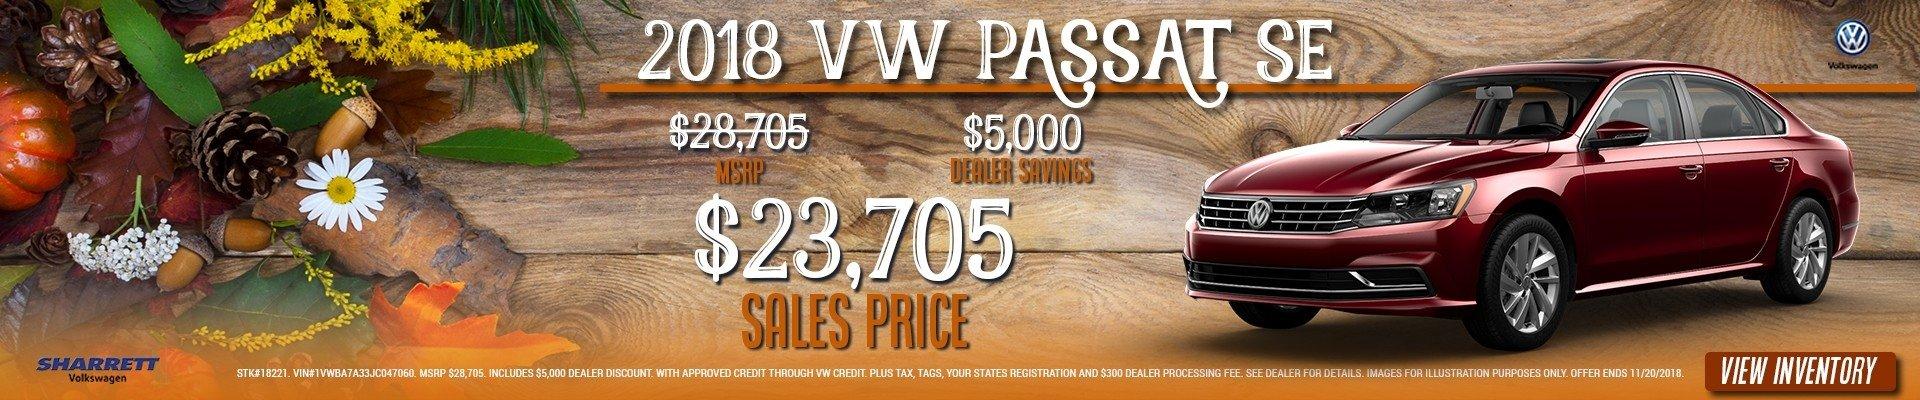 Get a new 2018 VW Passat for $23,705 –SAVE $5,000 at Sharrett Volkswagen